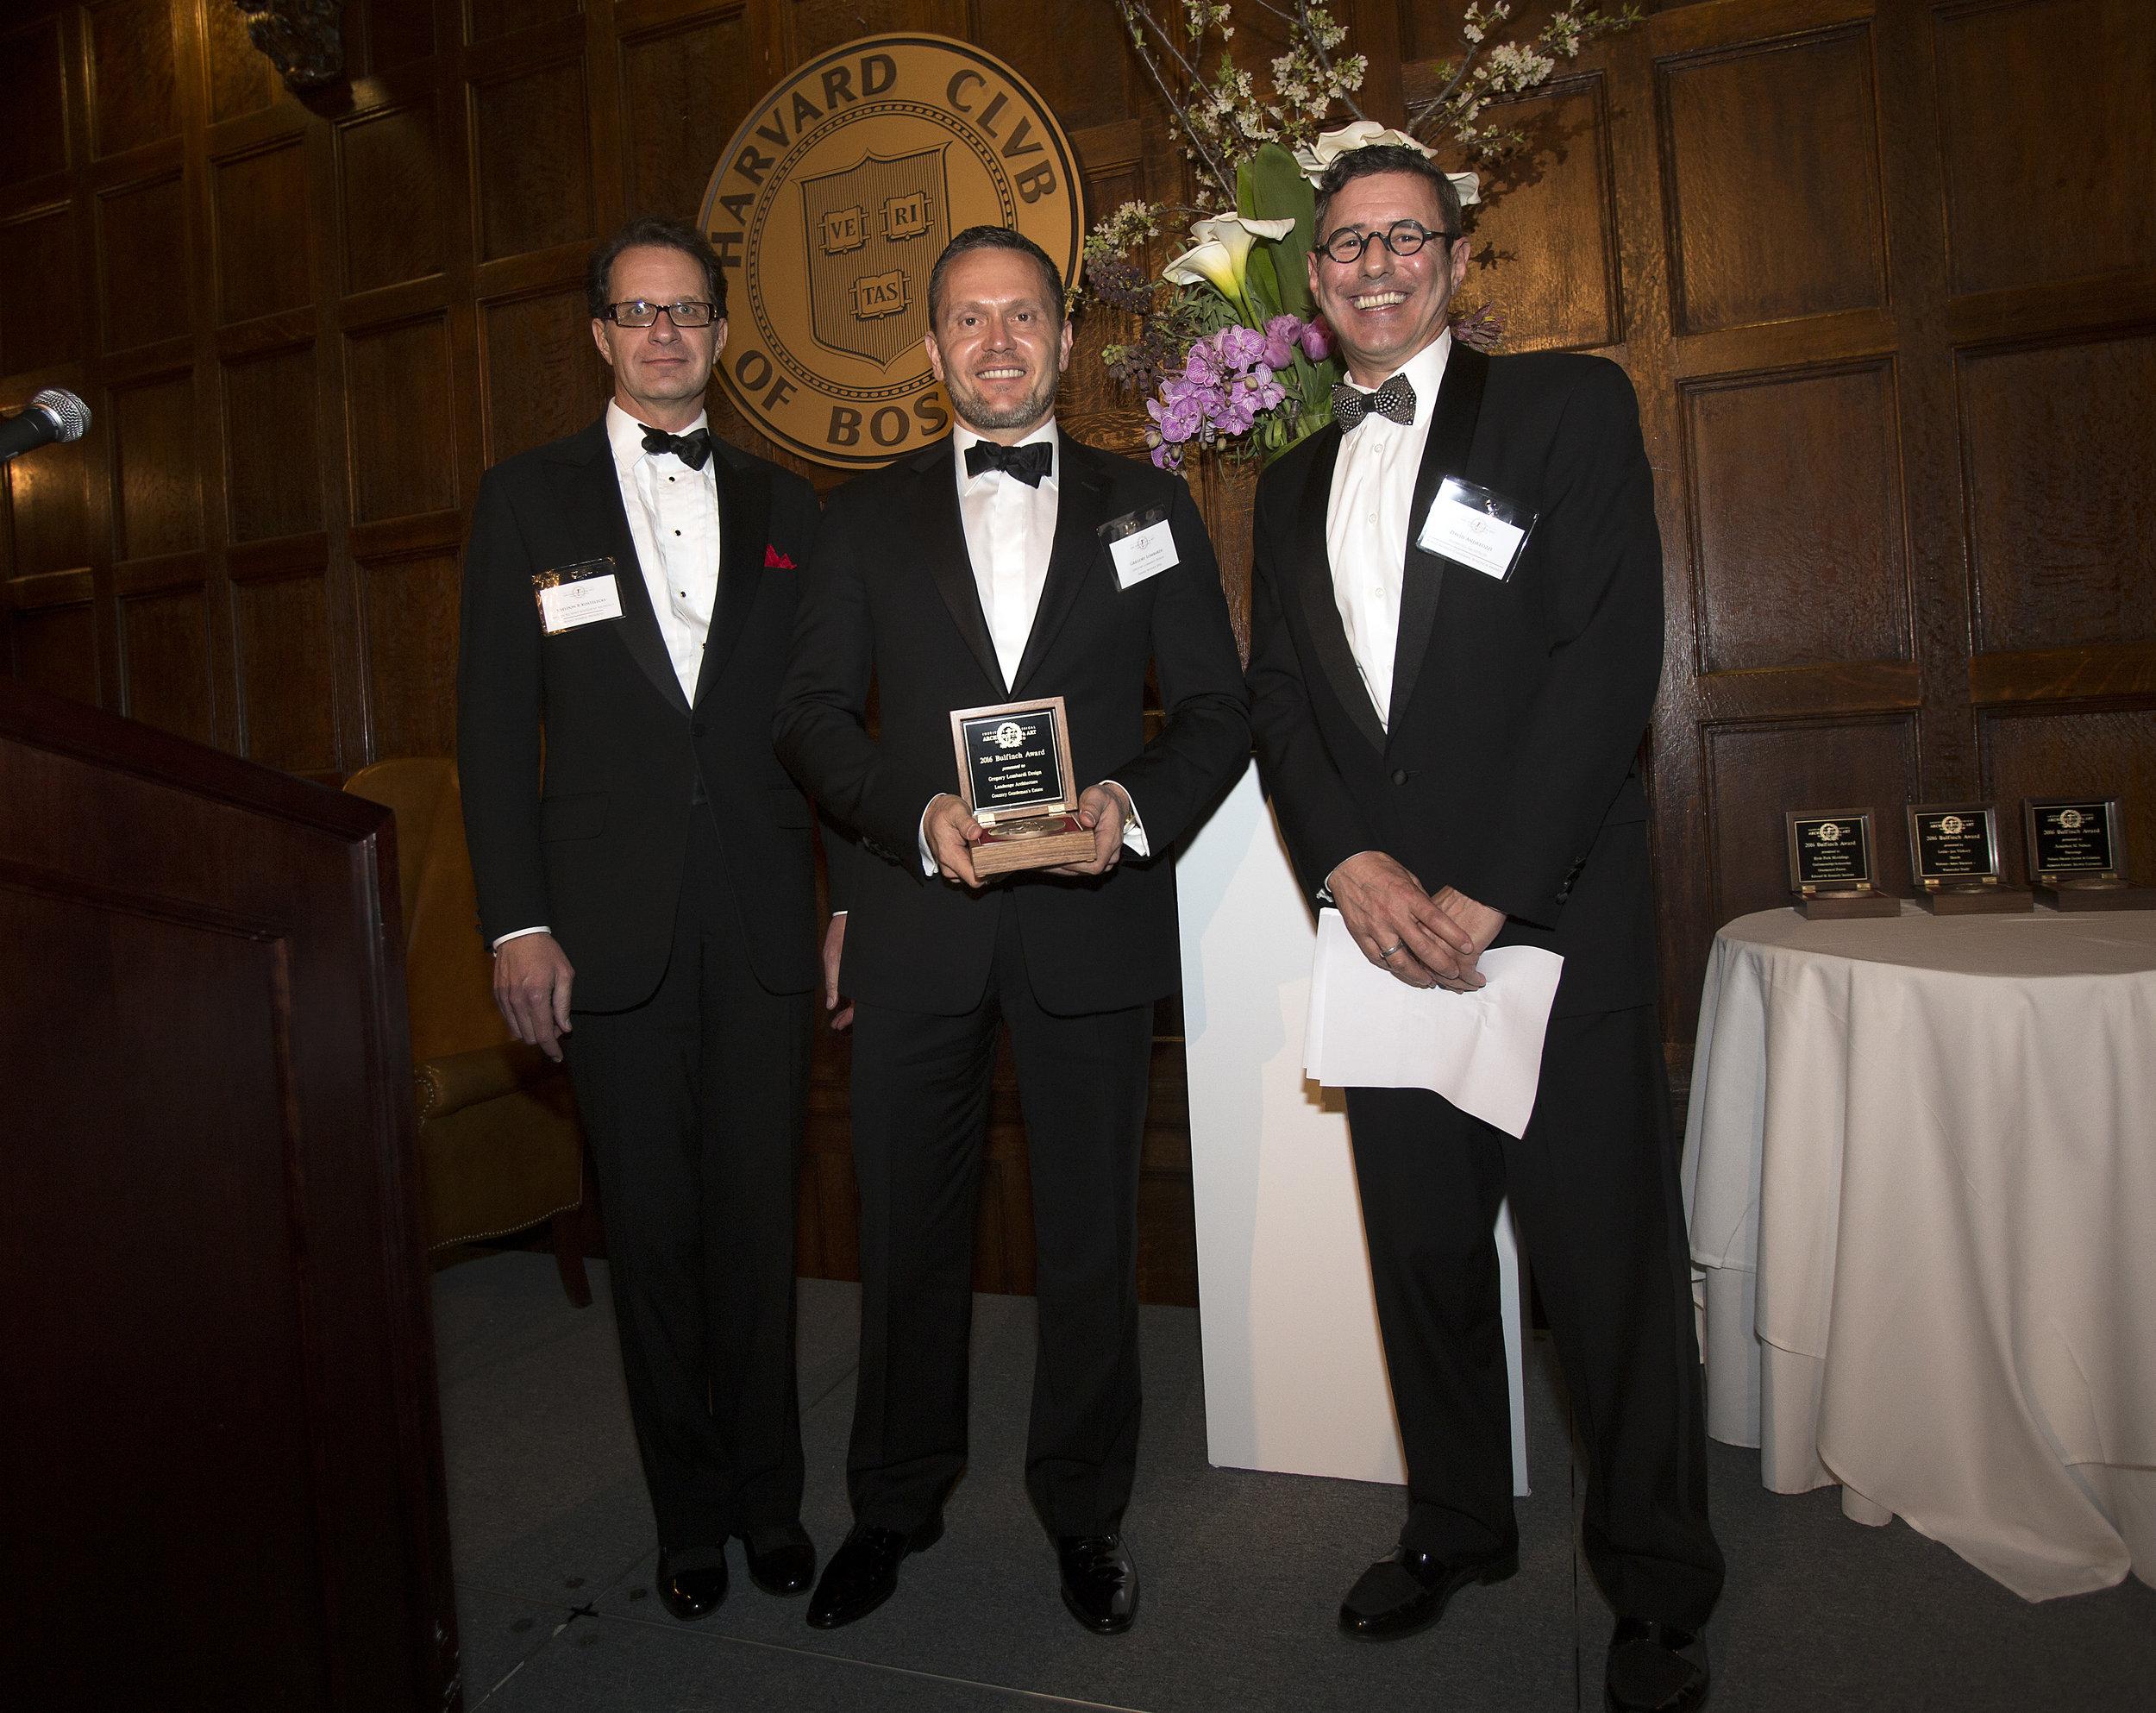 Chapter President and MC Sheldon Kostelecky, Bulfinch Award winner Greg Lombardi, Chapter VP and Bulfinch Awards chair David Andreozzi